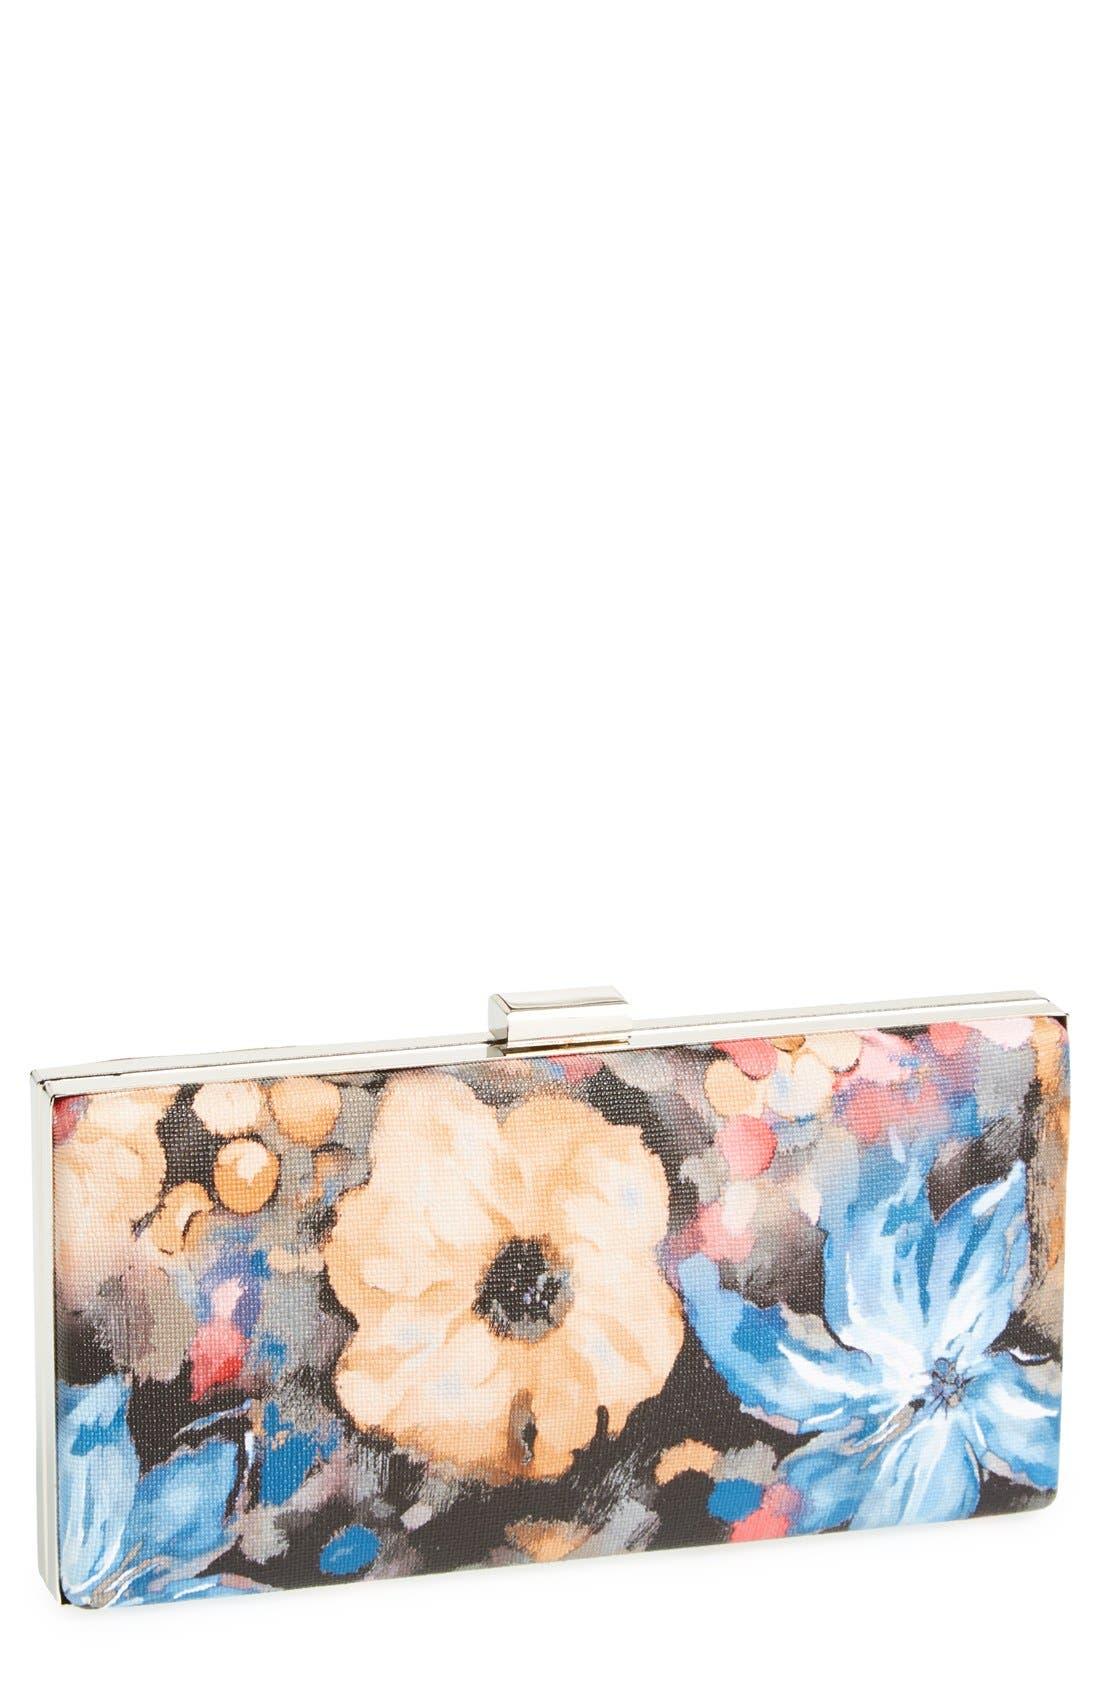 Main Image - Natasha Couture 'Watercolor' Box Clutch